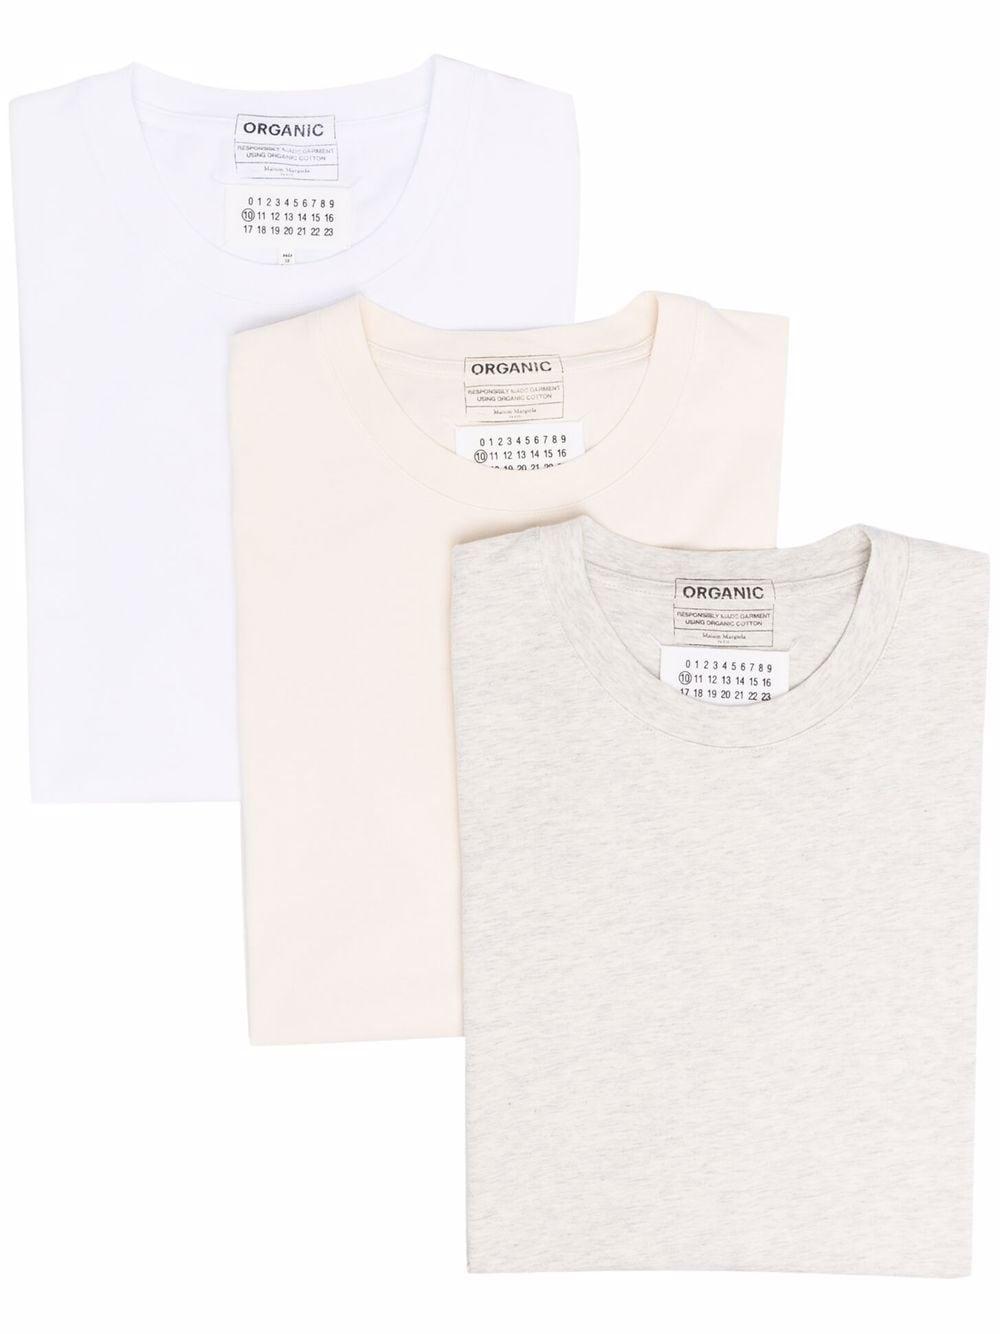 tripack t-shirt uomo in cotone MAISON MARGIELA | T-shirt | S50GC0652 S23973961